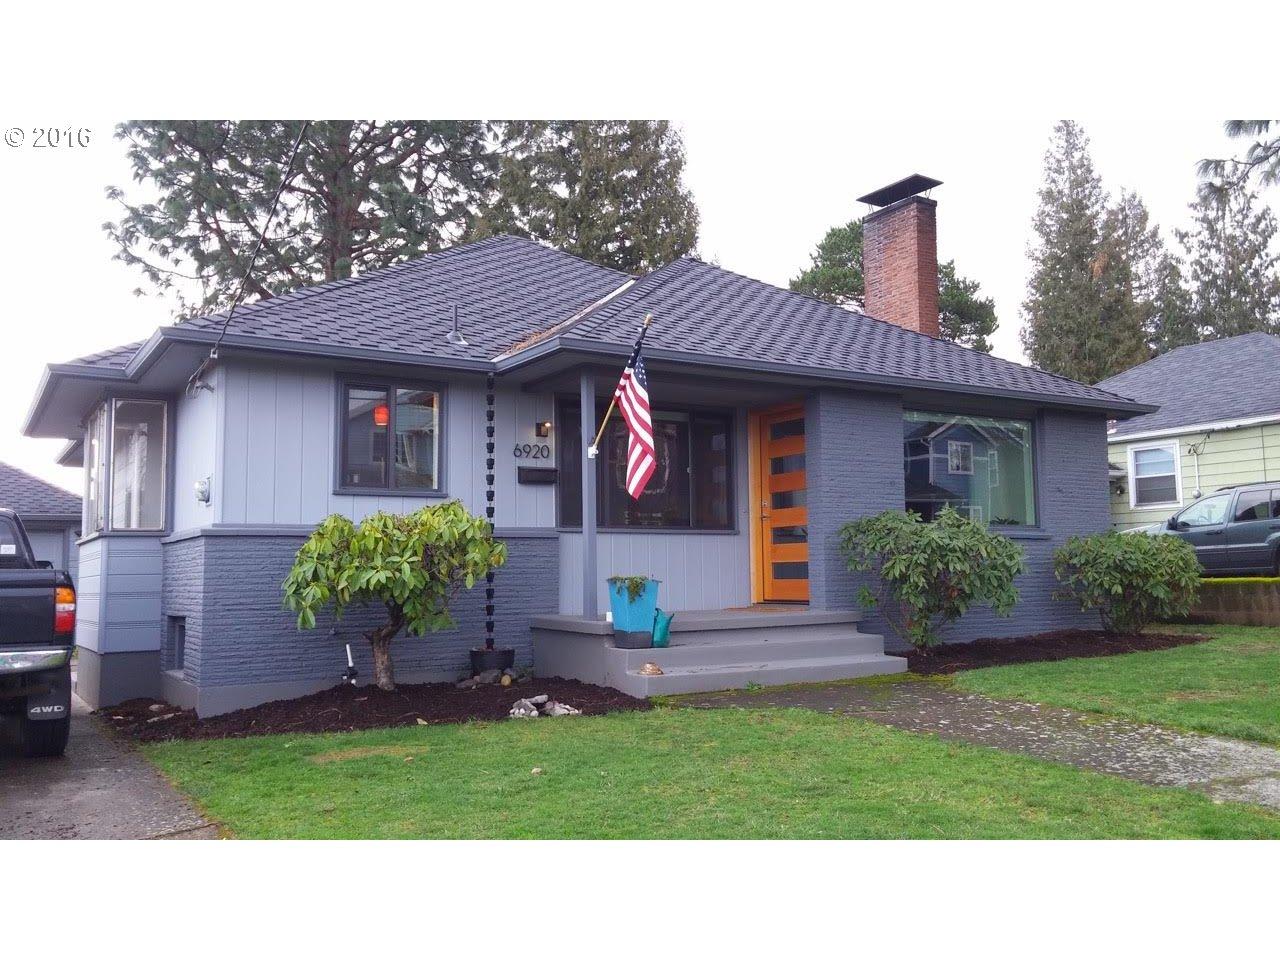 6920 N Congress Ave, Portland, OR